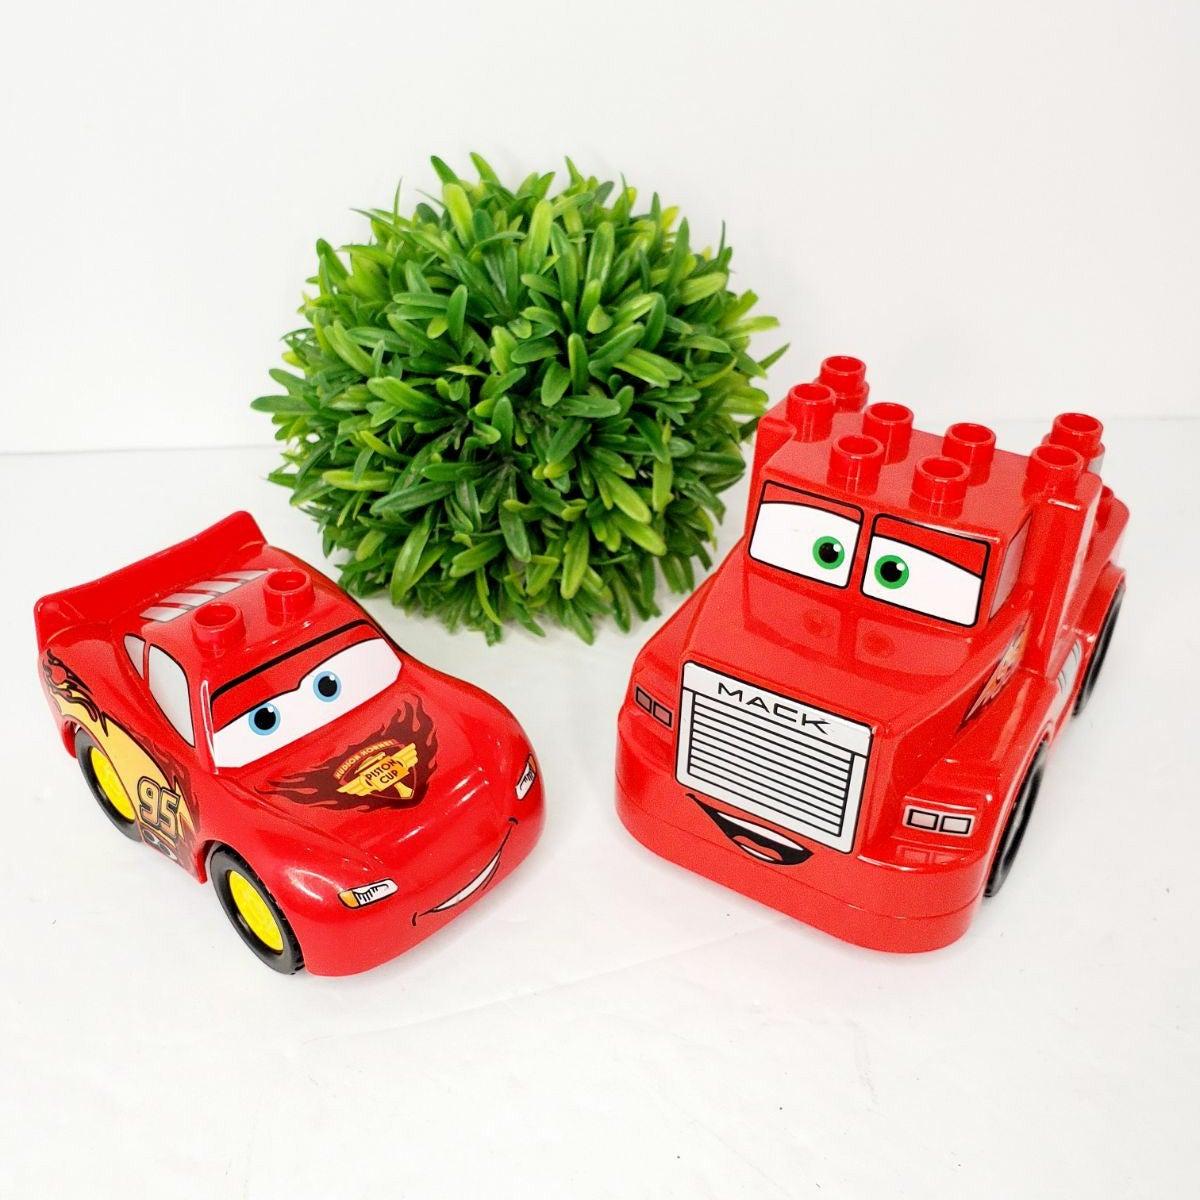 Rare Lego Duplo JALOPY CAR BLOCK from DISNEY PIXAR CARS MOVIE PRINTED BLOCK